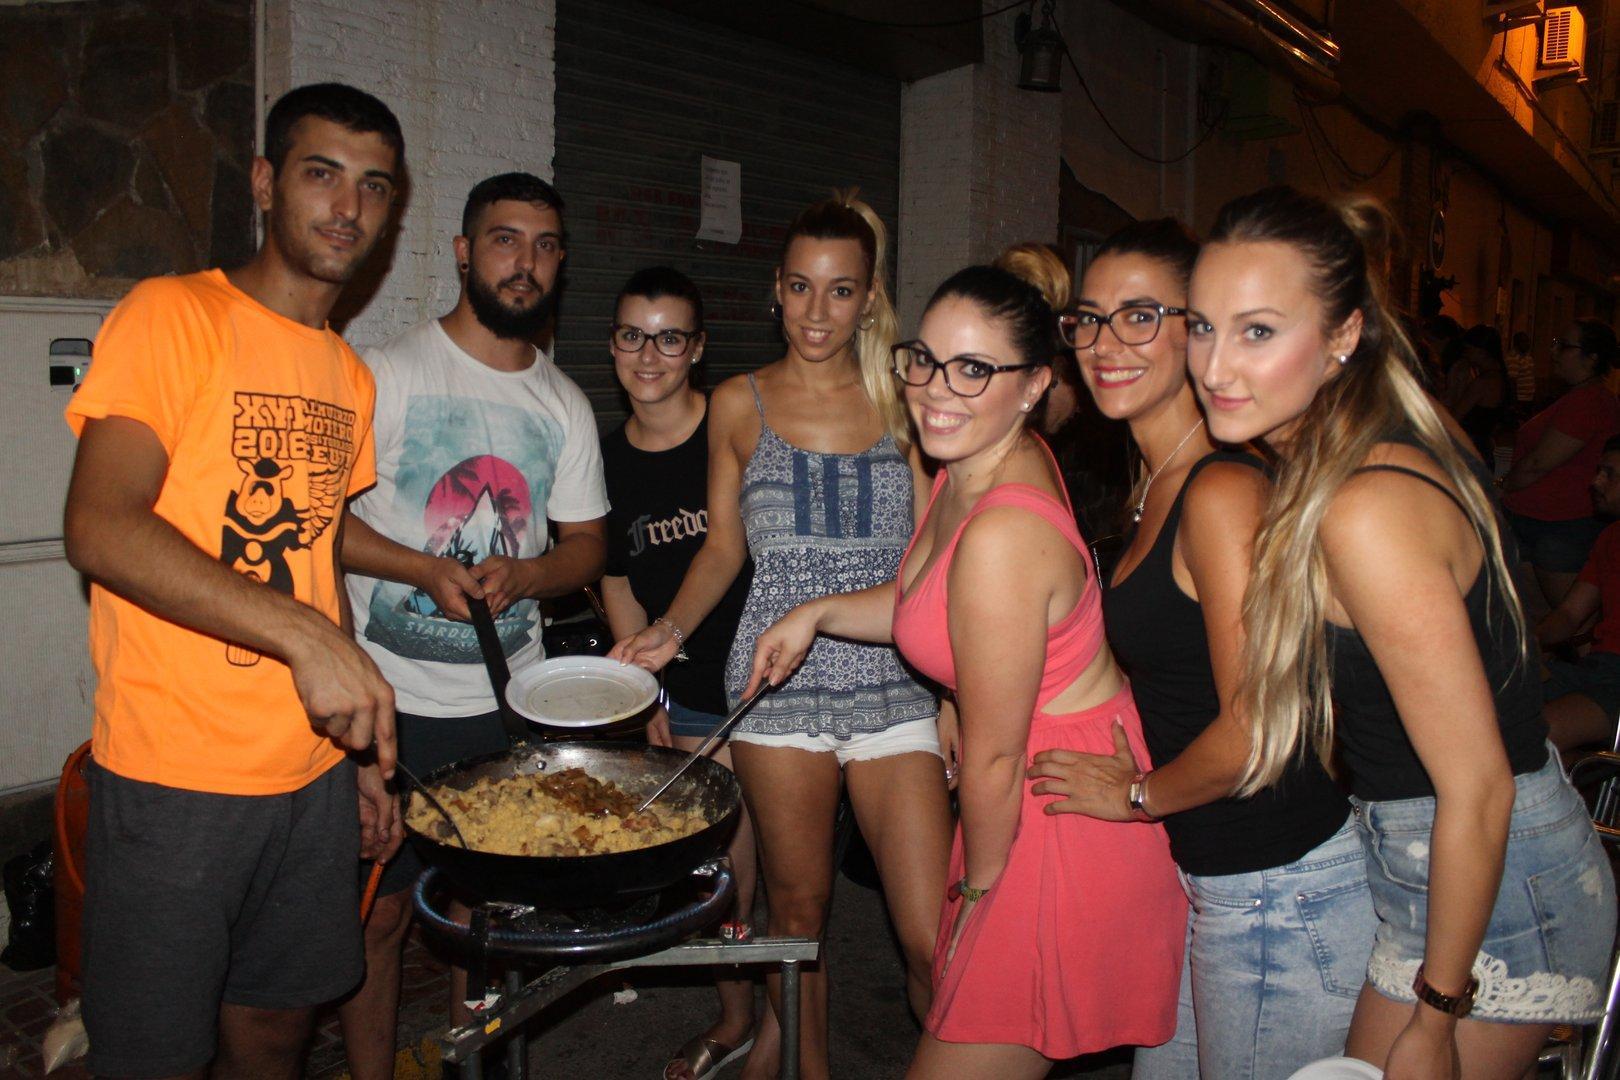 Atico Pub-Gachasmigas-Fiestas-ceutí-2017